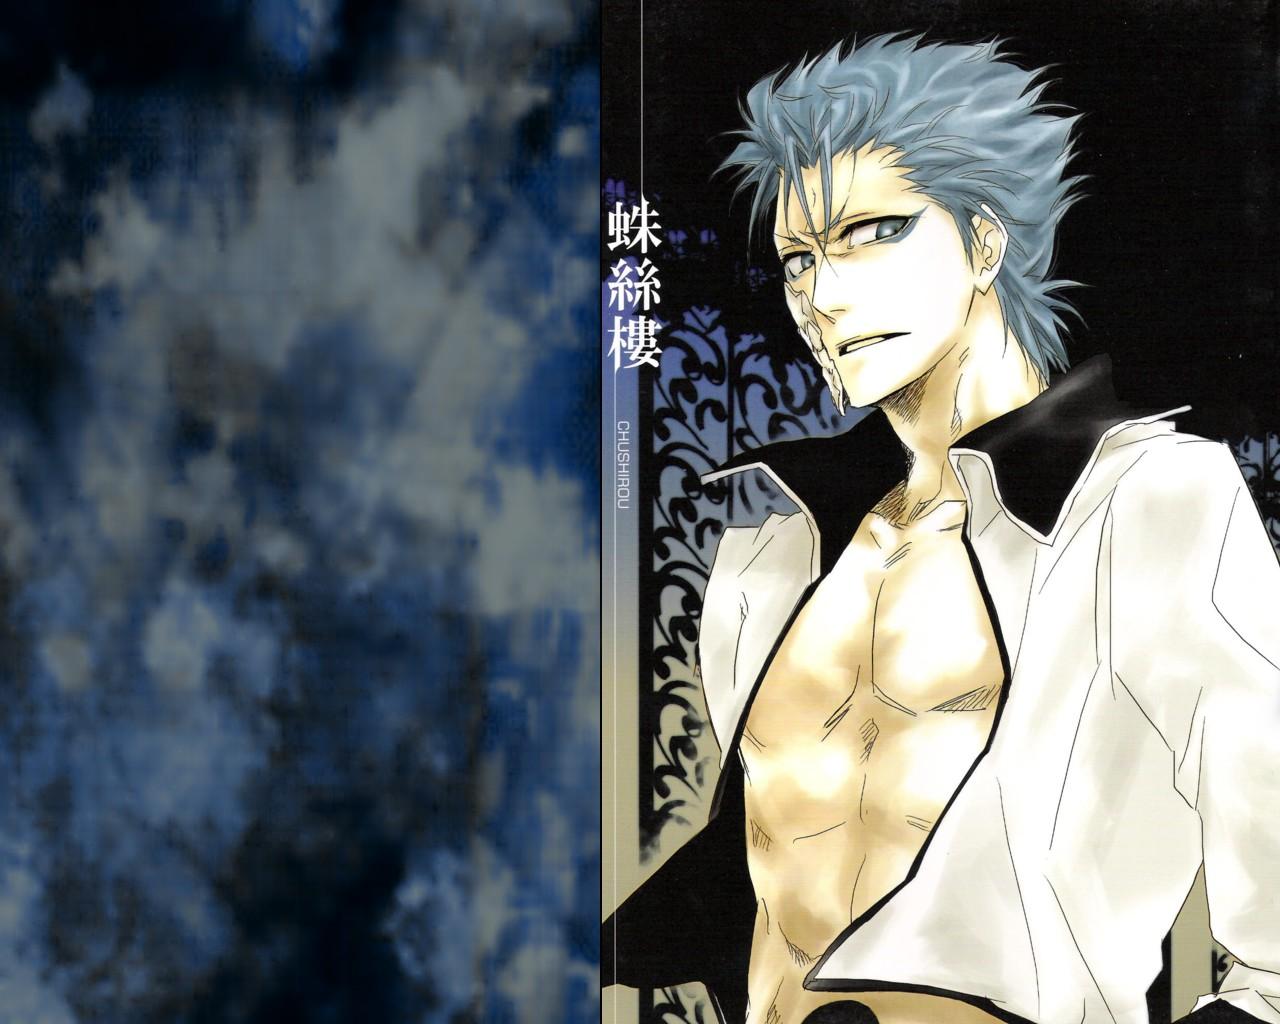 Tags Anime BLEACH Grimmjow Jeagerjaques Wallpaper Espada